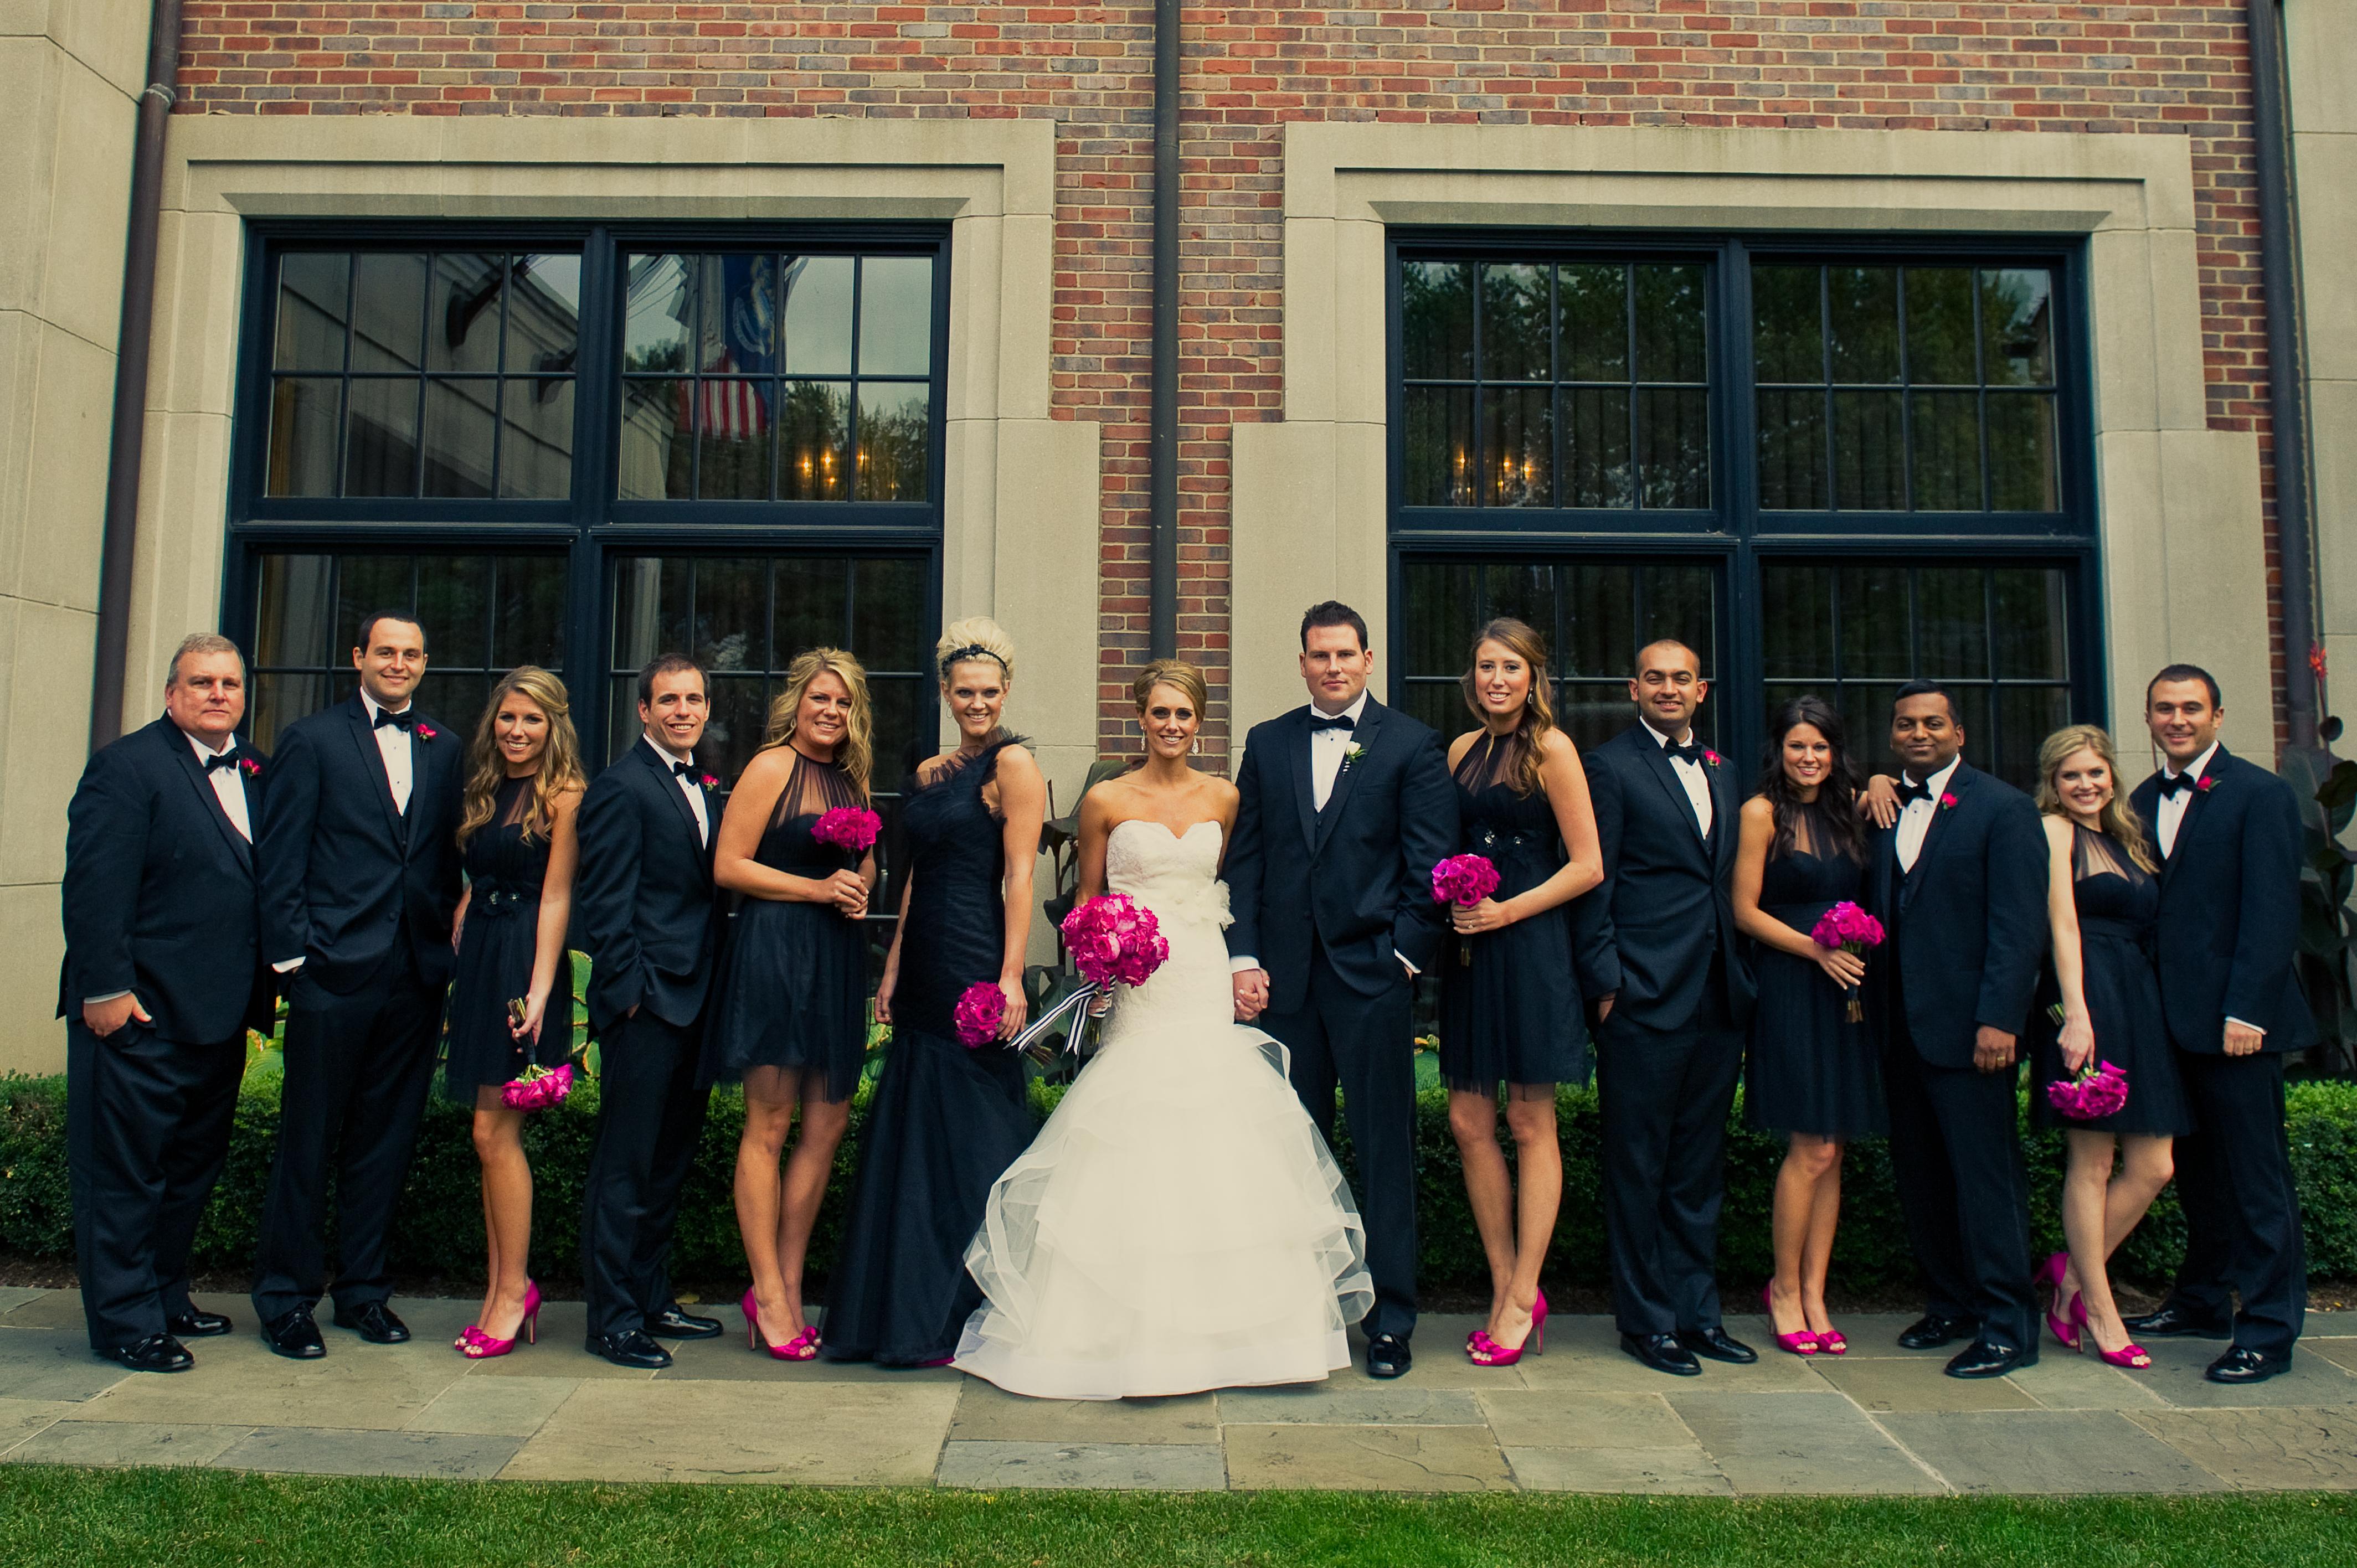 Black Wedding Bridal Party | Dress images